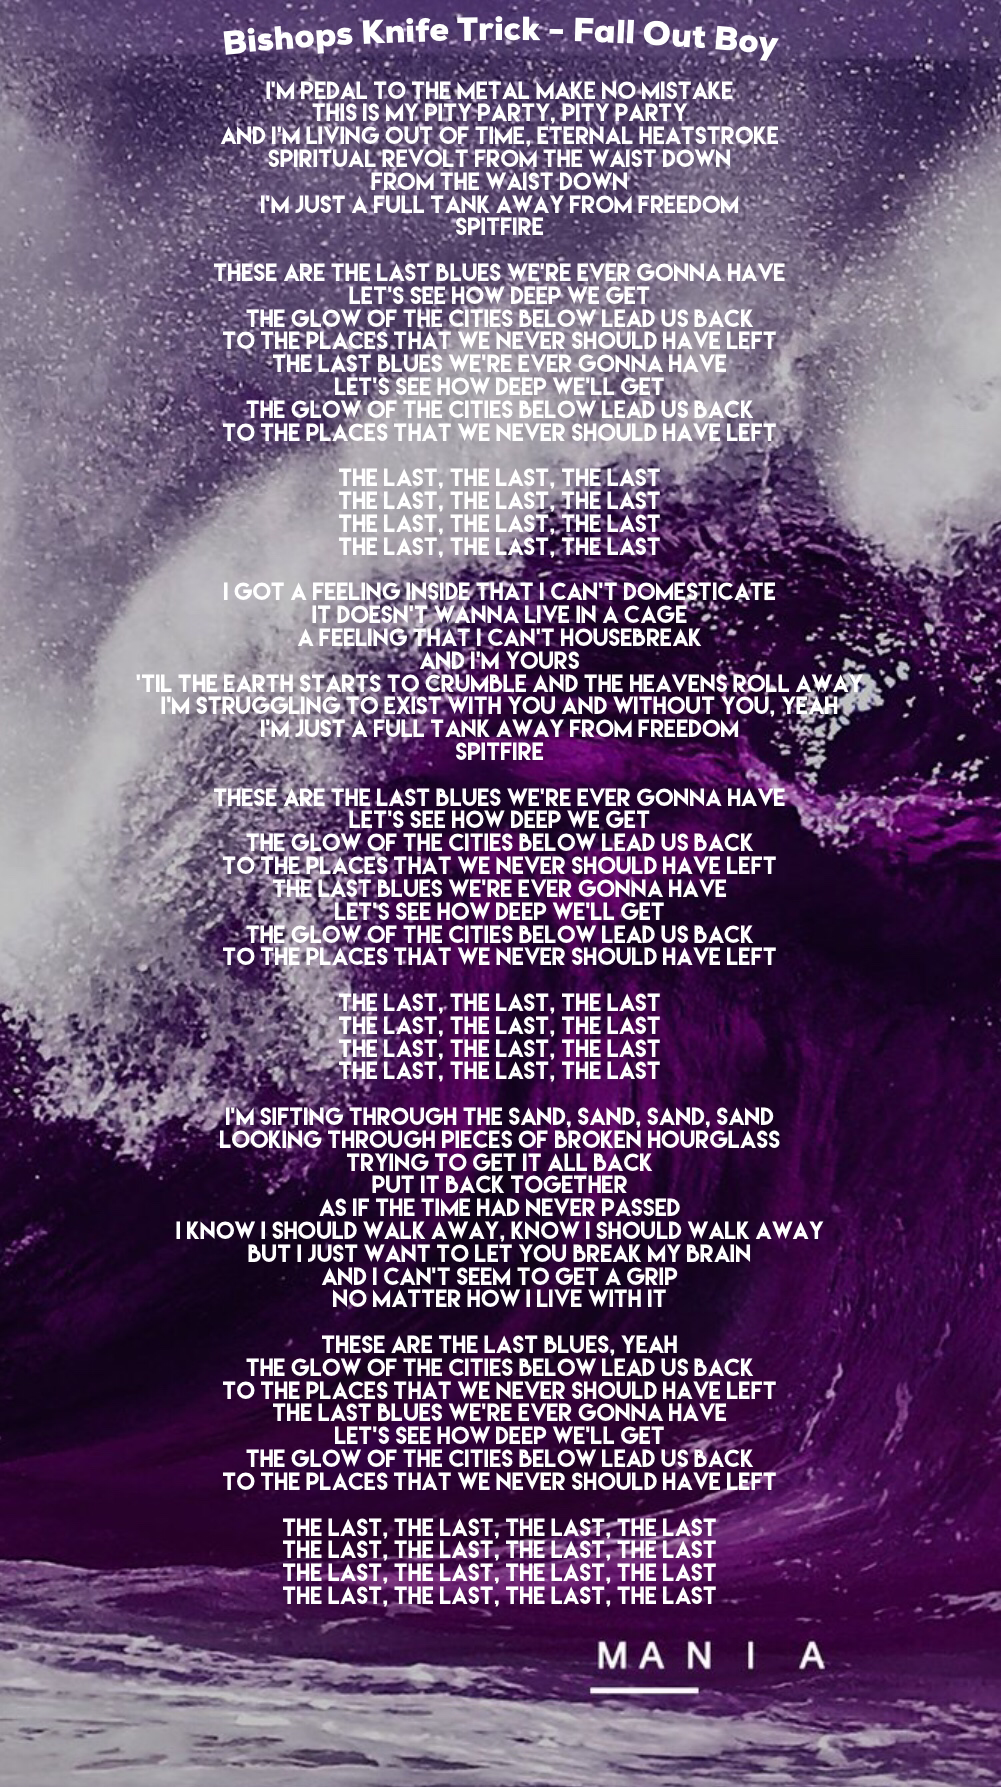 THE BISHOPS LYRICS - SONGLYRICS.com | The Definitive ...